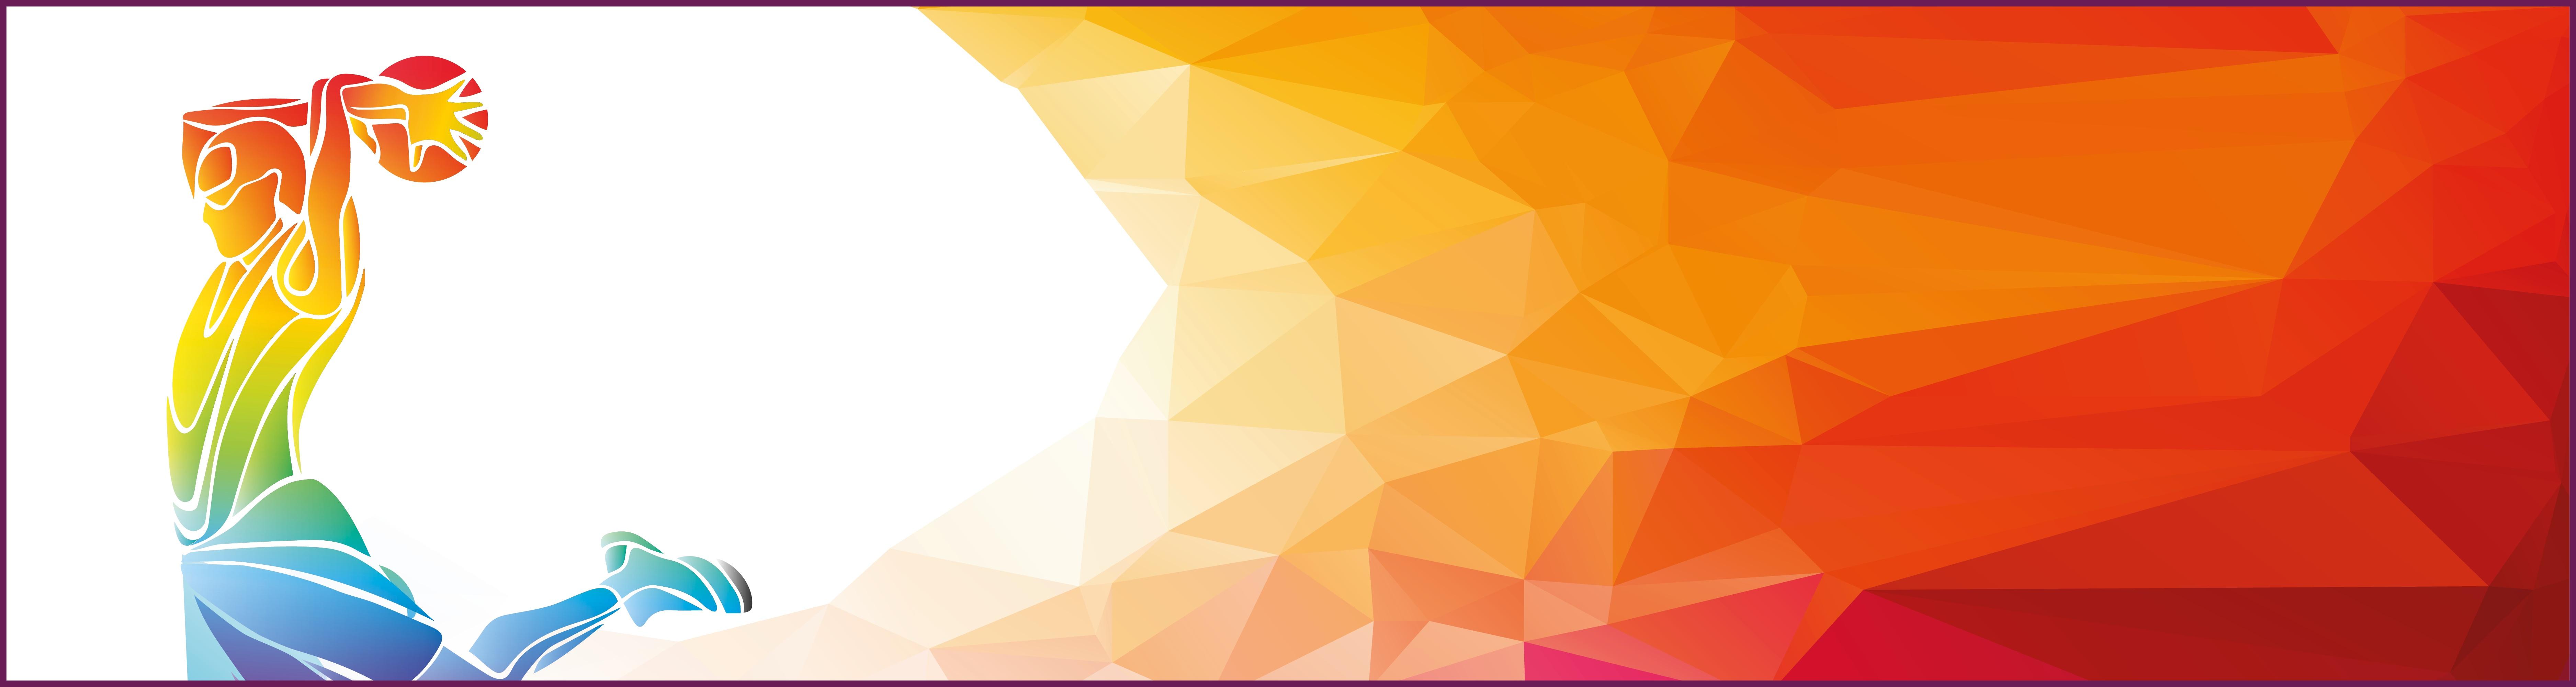 Secondary_App_-_blank_hero_image.jpg